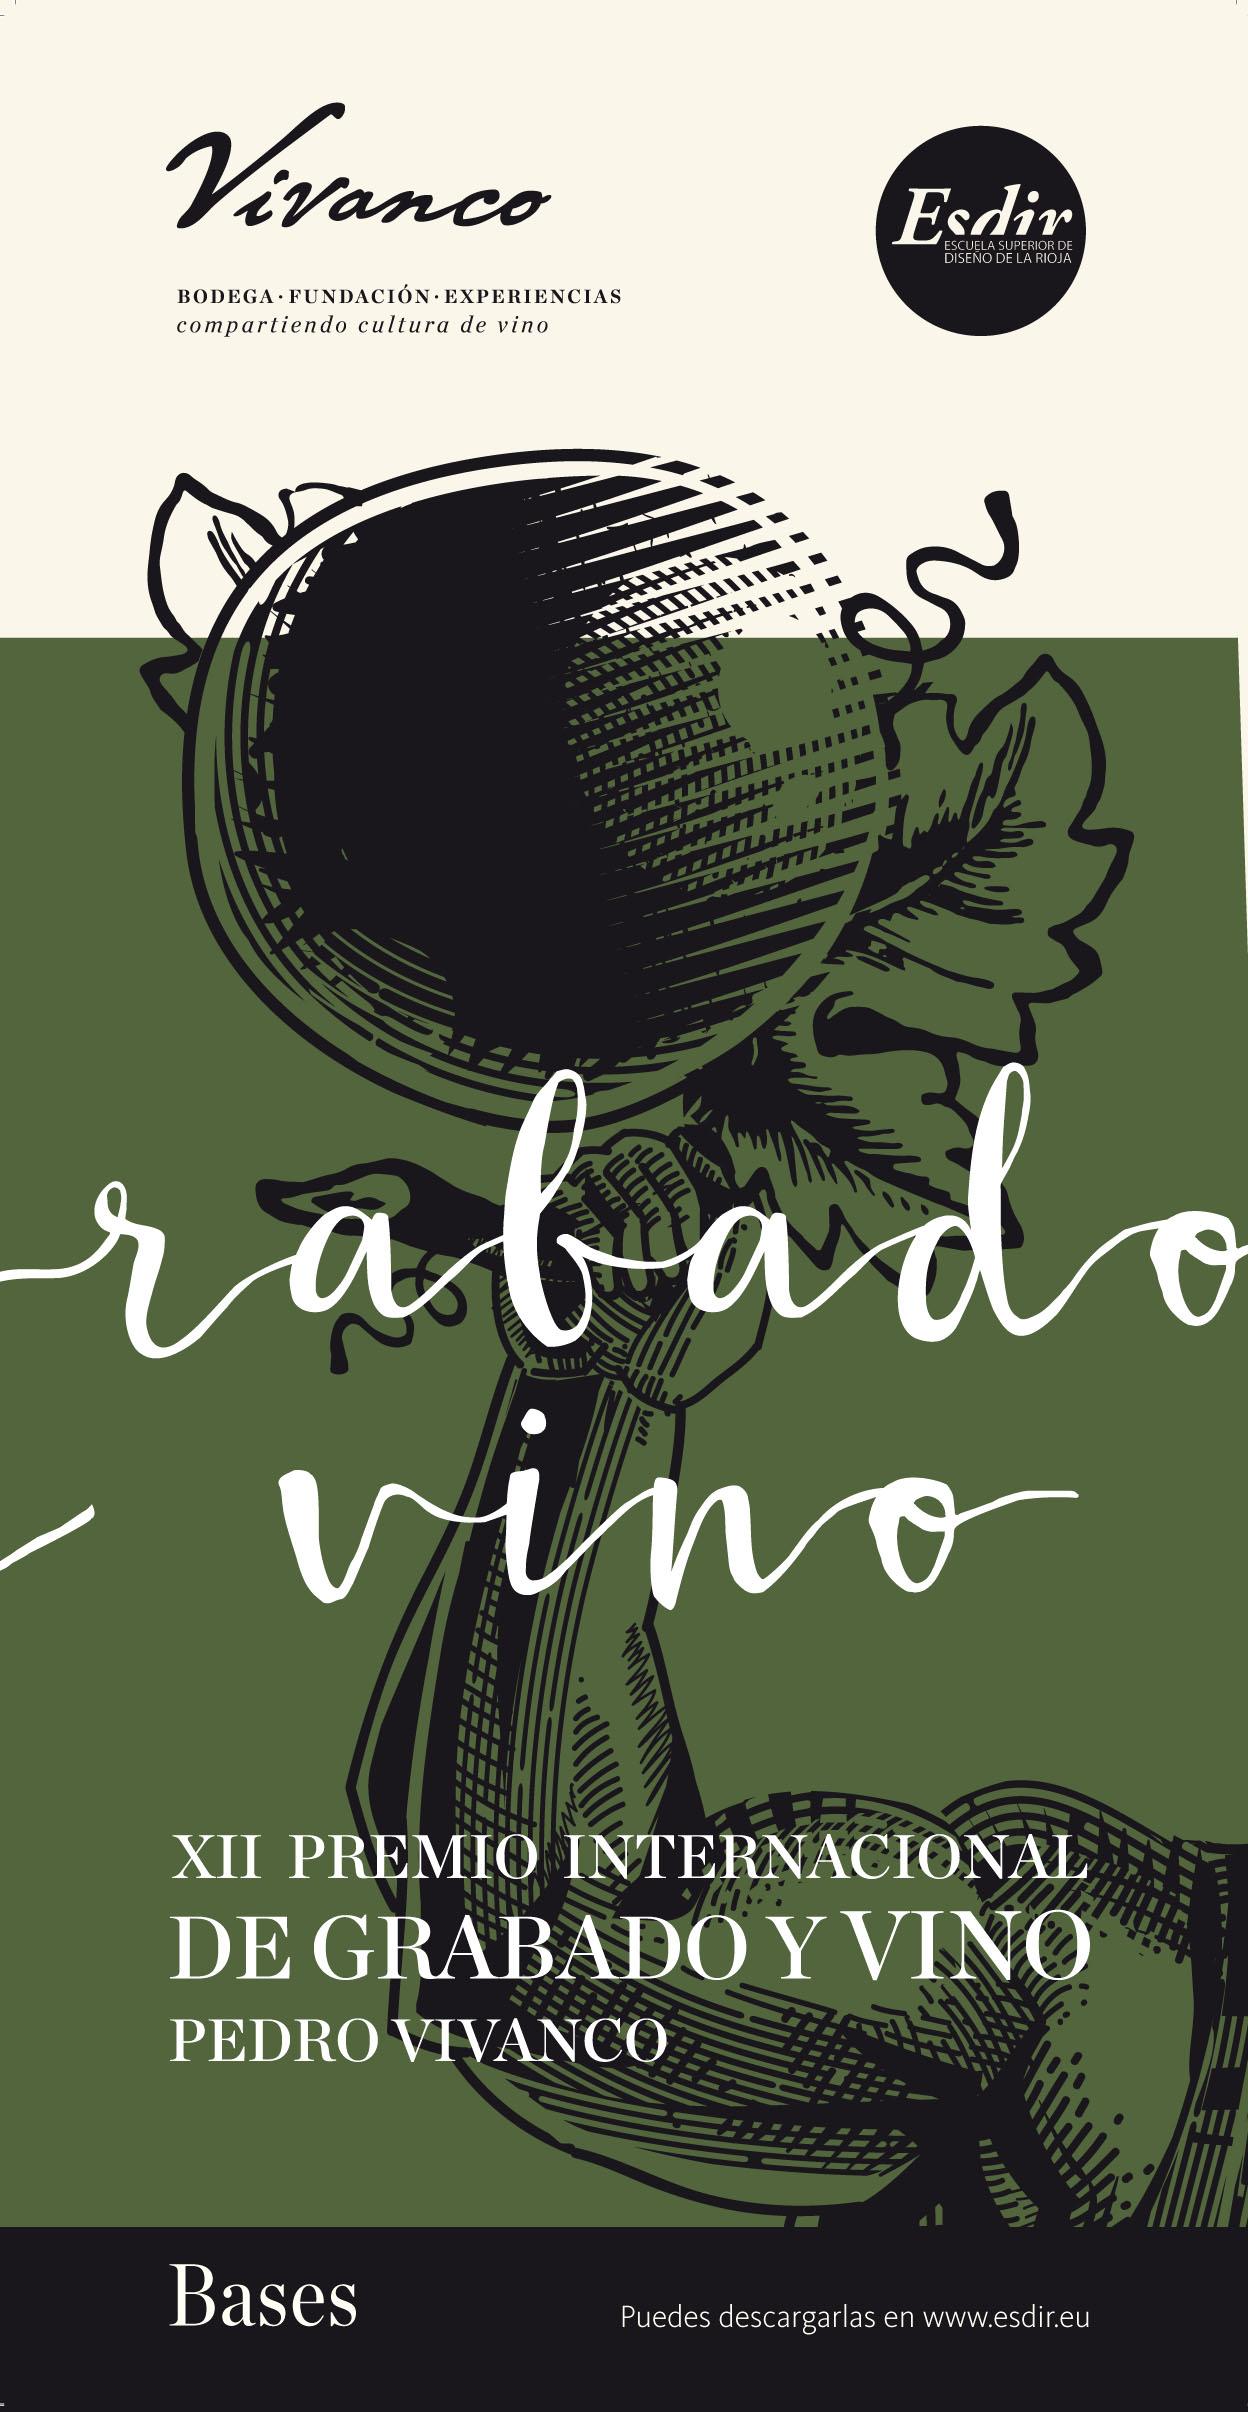 Bases del XII Premio de Grabado y Vino Pedro Vivanco